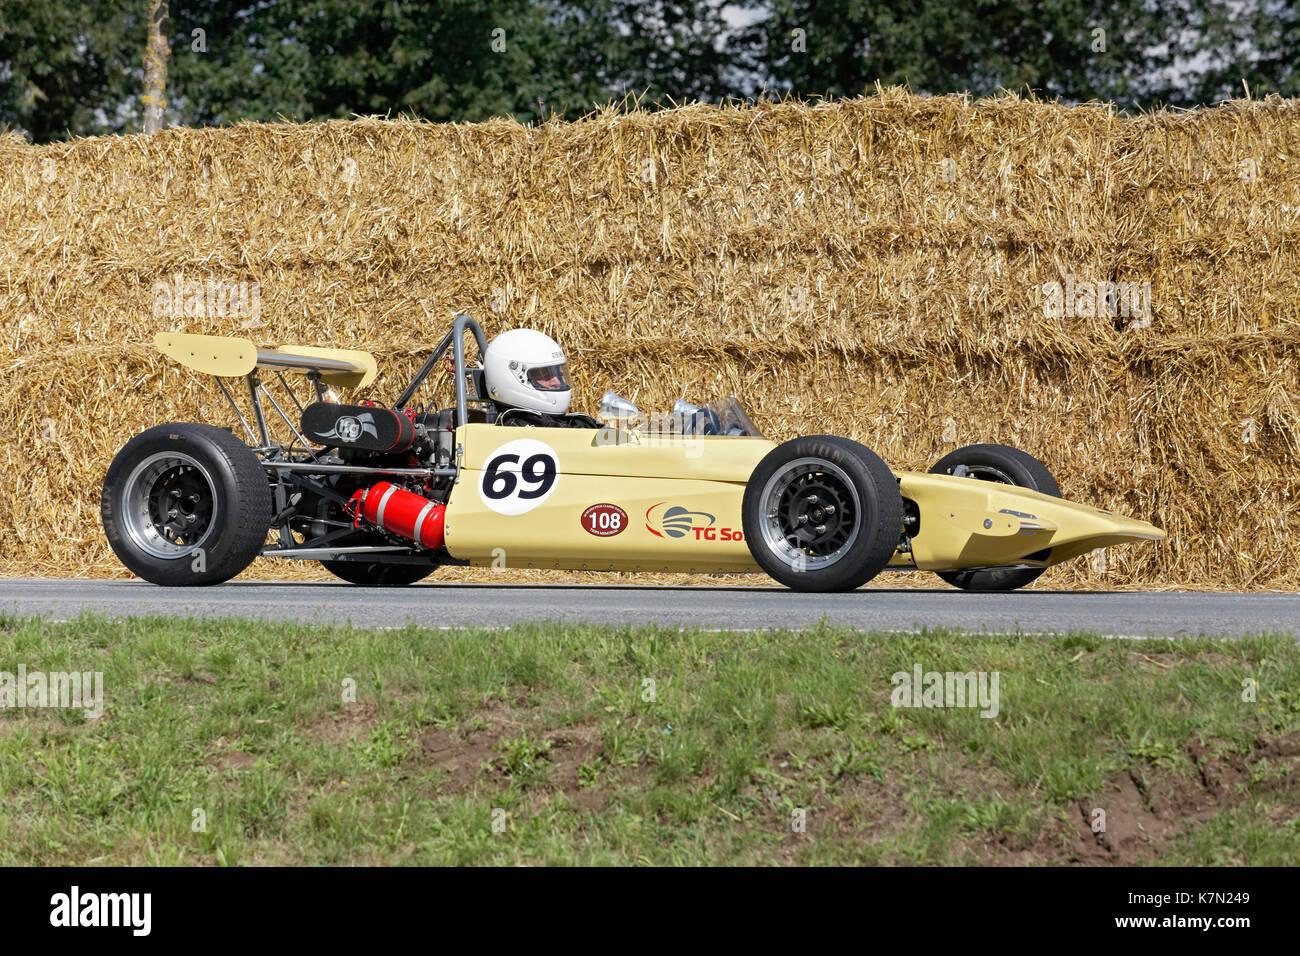 Vintage Car Racing Lotus Stock Photos & Vintage Car Racing Lotus ...